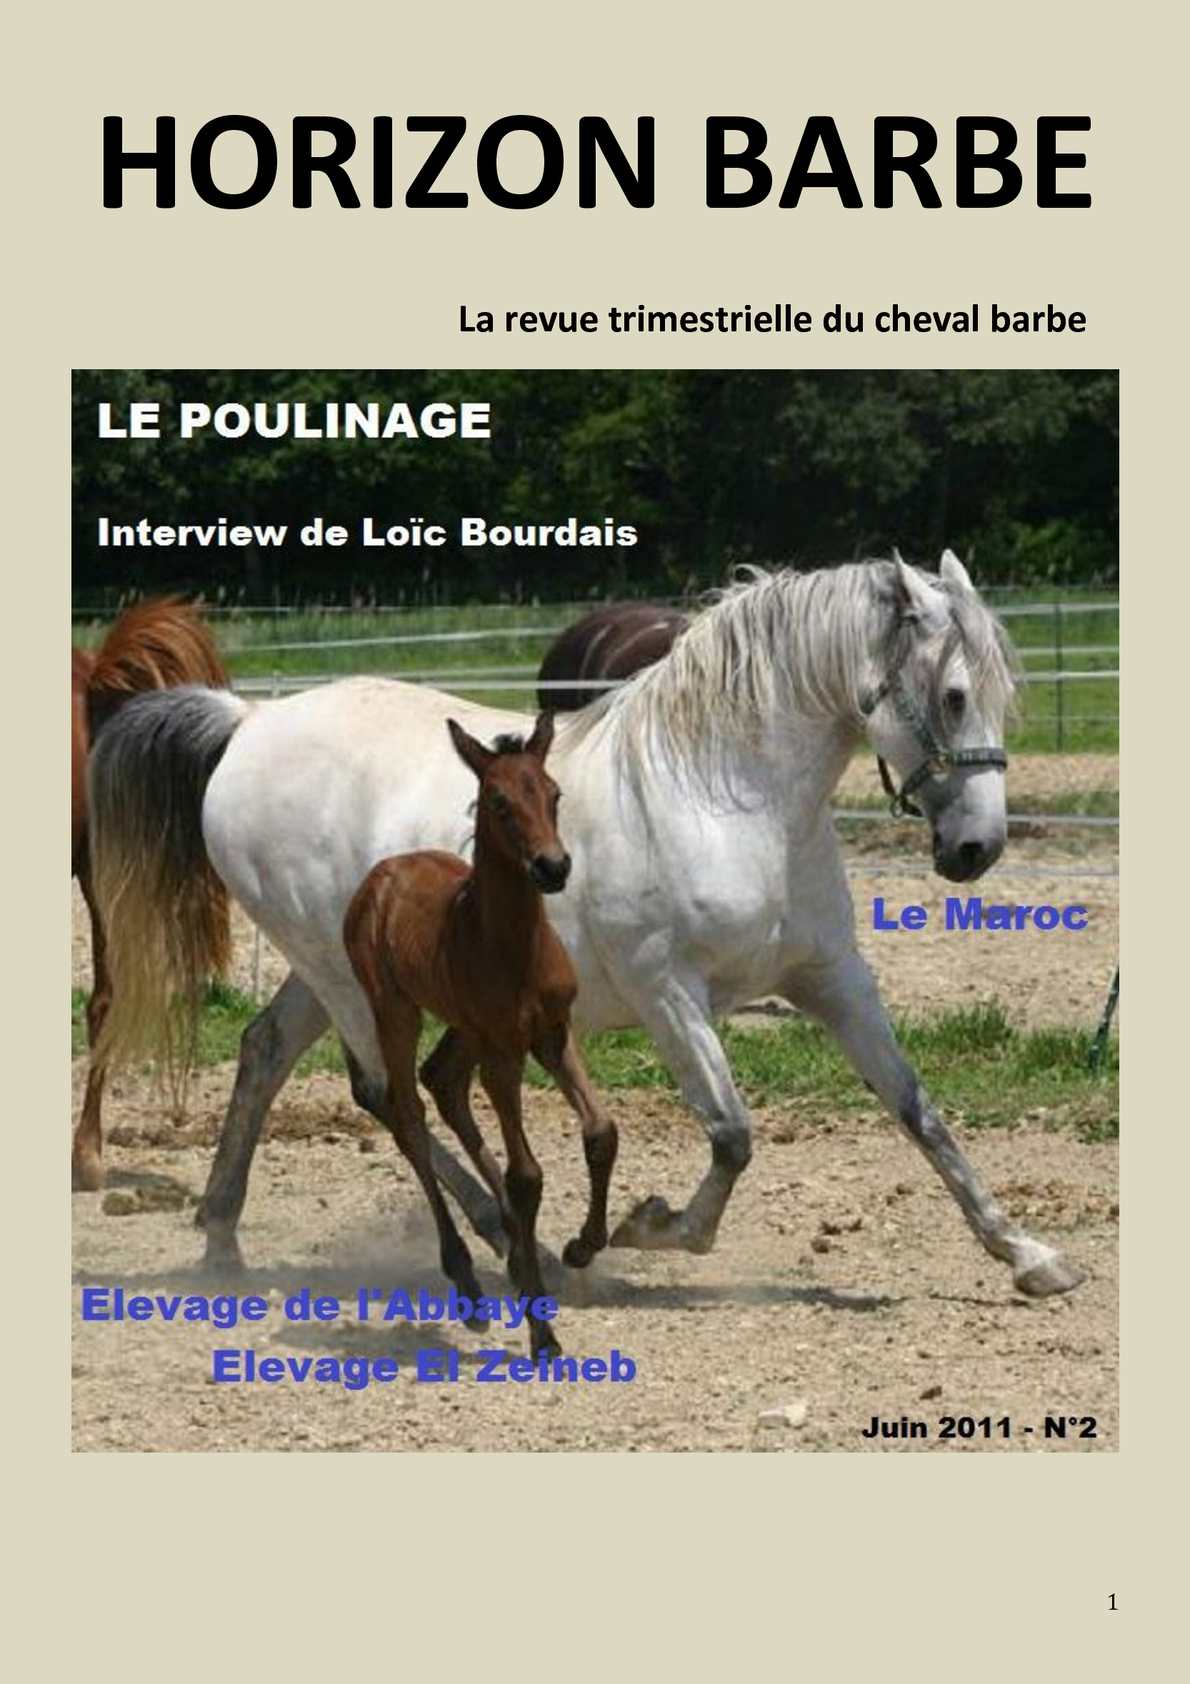 Horizon Barbe, n°2 revue trimestrielle du cheval Barbe